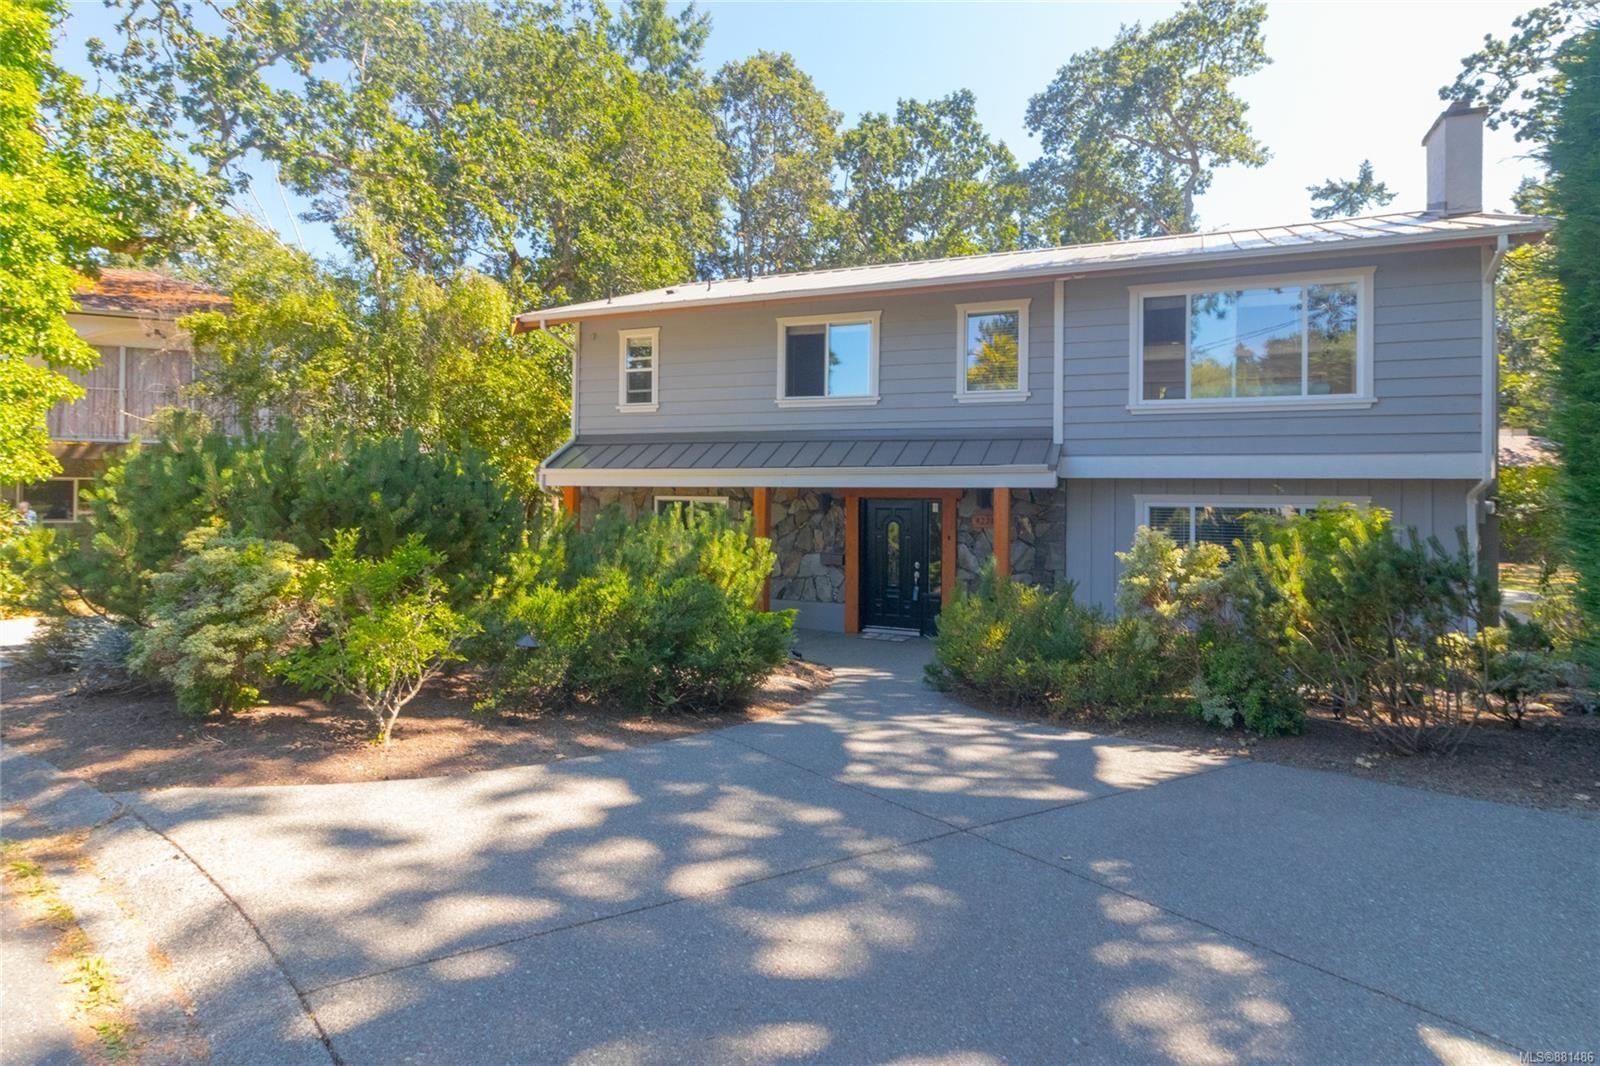 Main Photo: 4228 Parkside Pl in : SE Mt Doug House for sale (Saanich East)  : MLS®# 881486